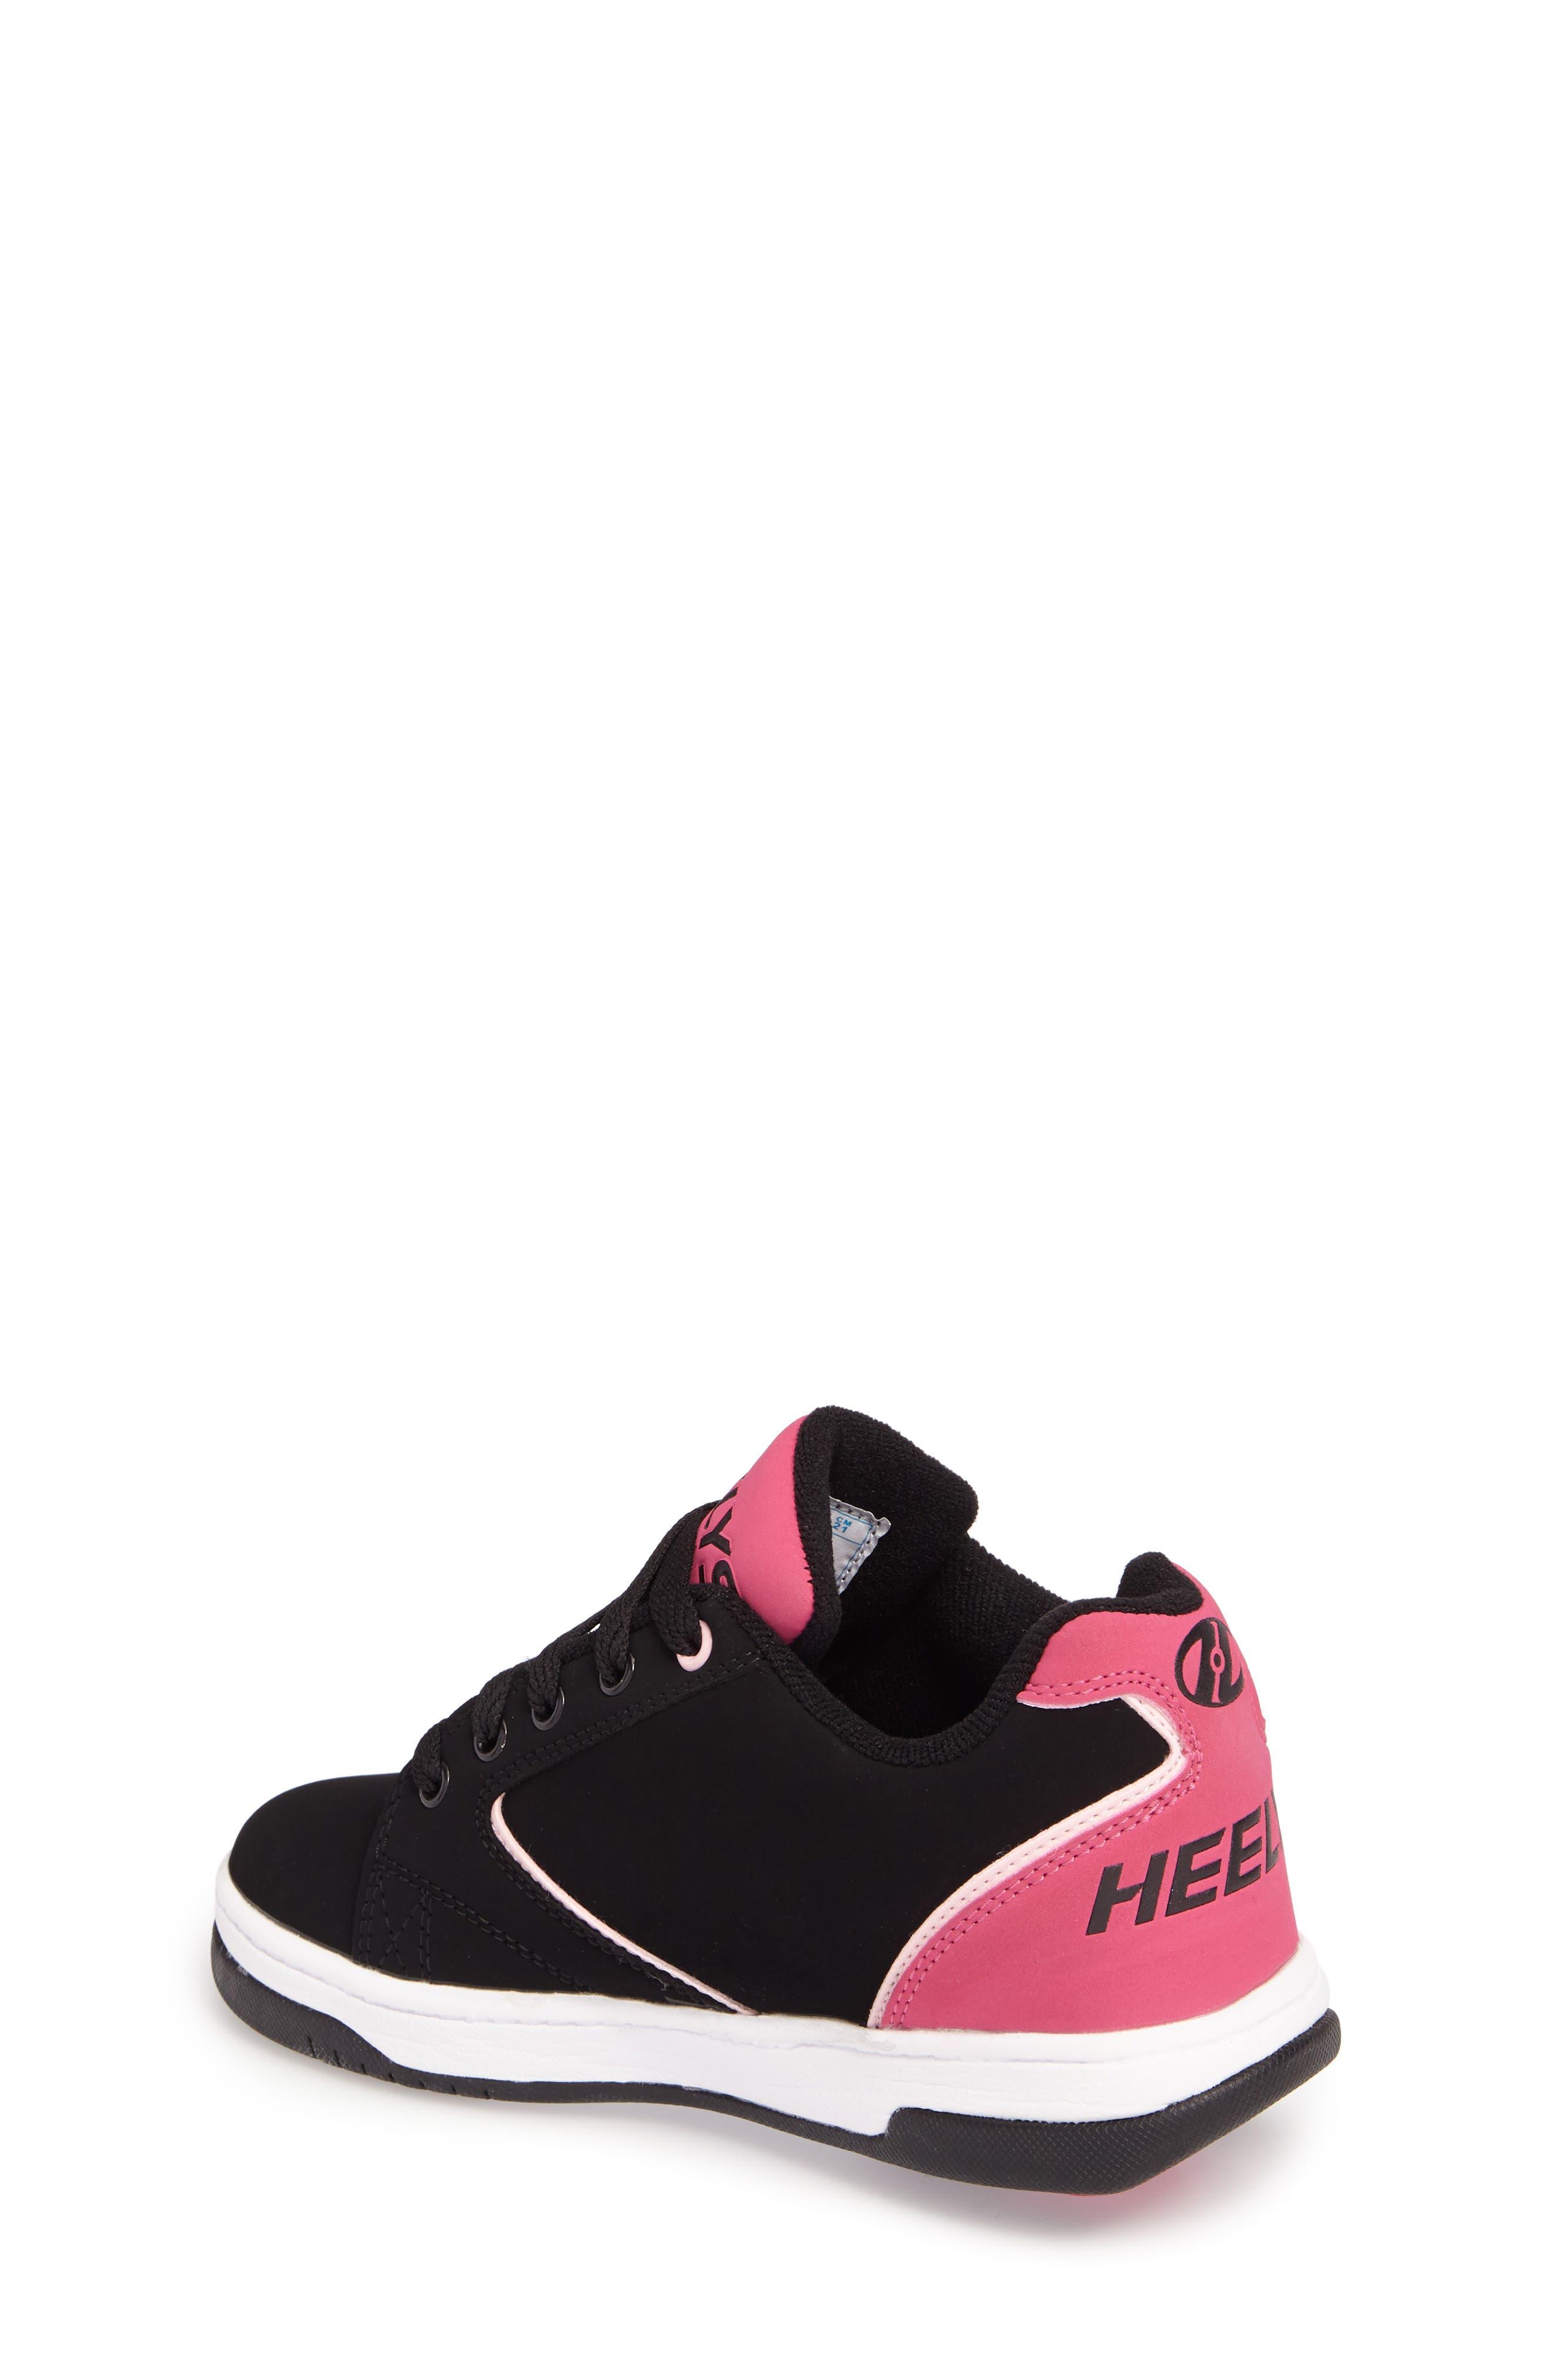 Propel 2.0 Sneaker,                             Alternate thumbnail 2, color,                             BLACK/ PINK/ WHITE